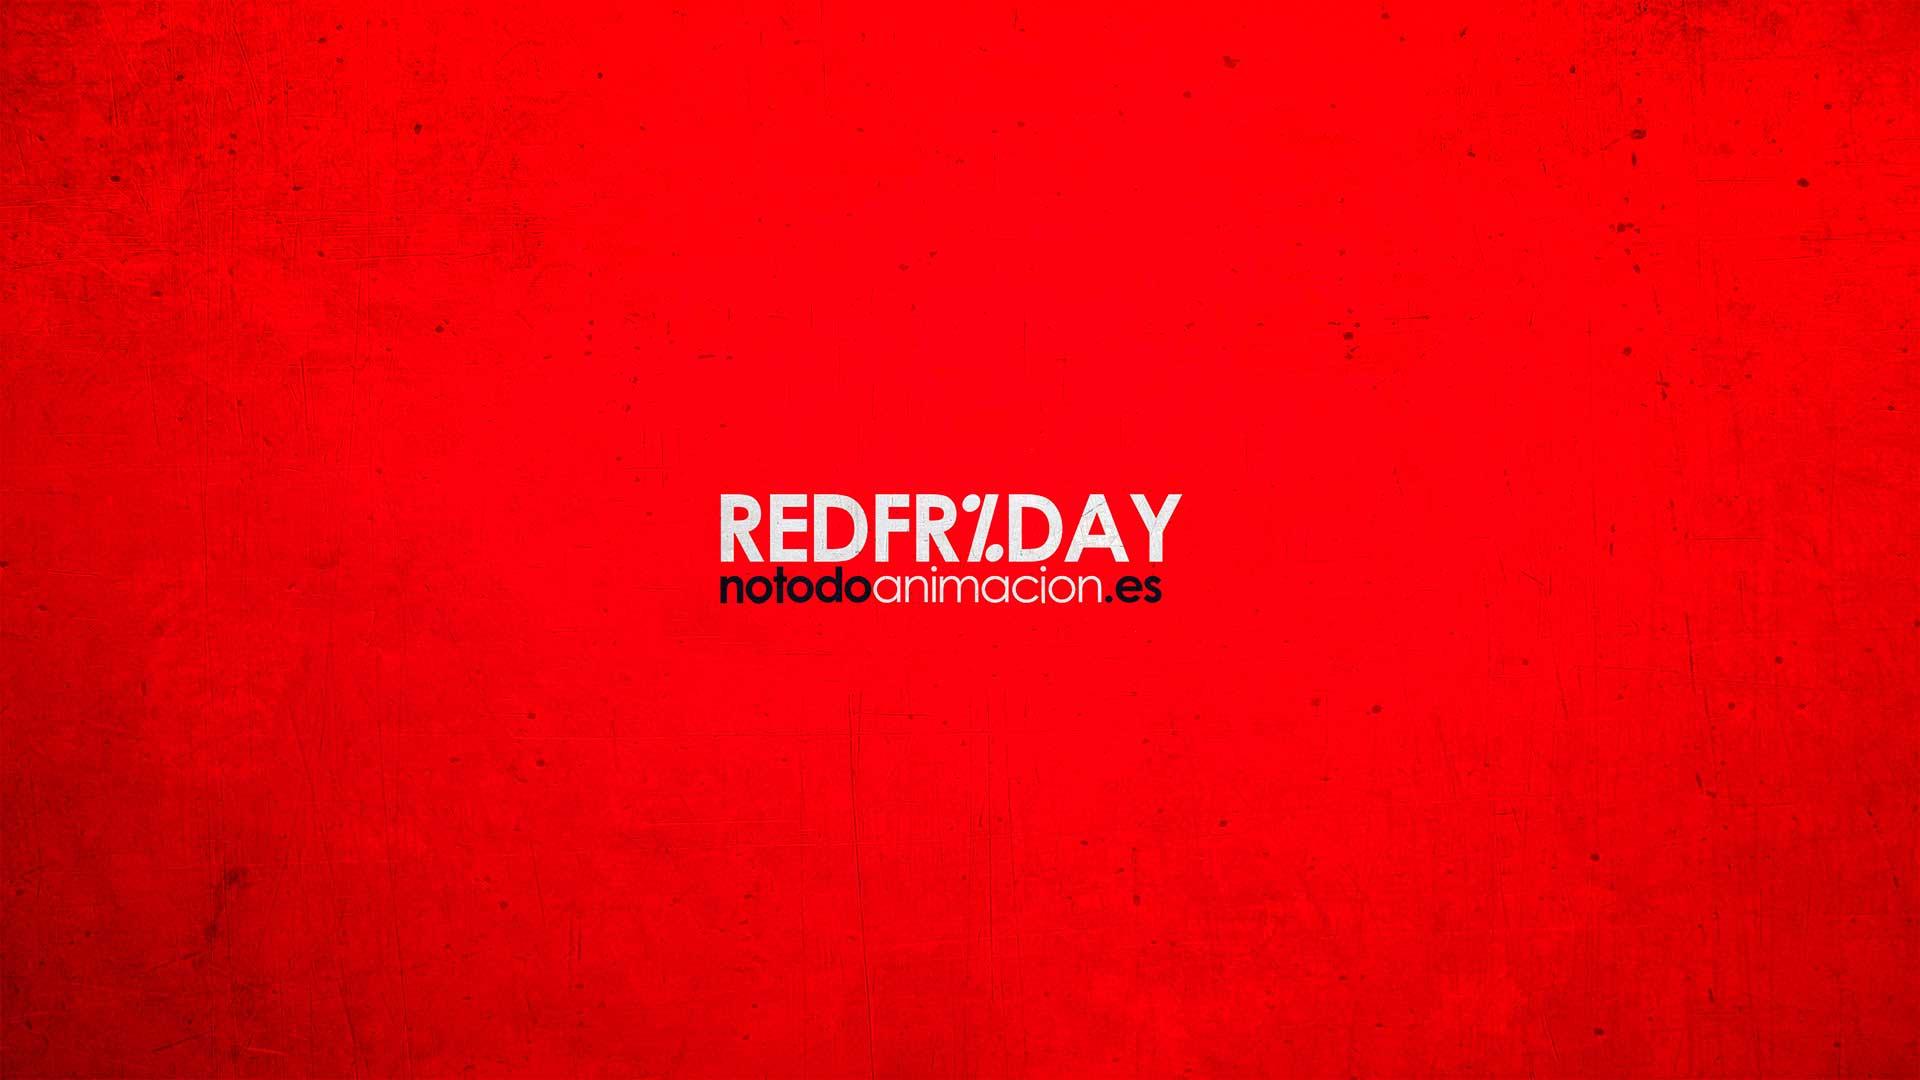 Red Friday Notodoanimacion